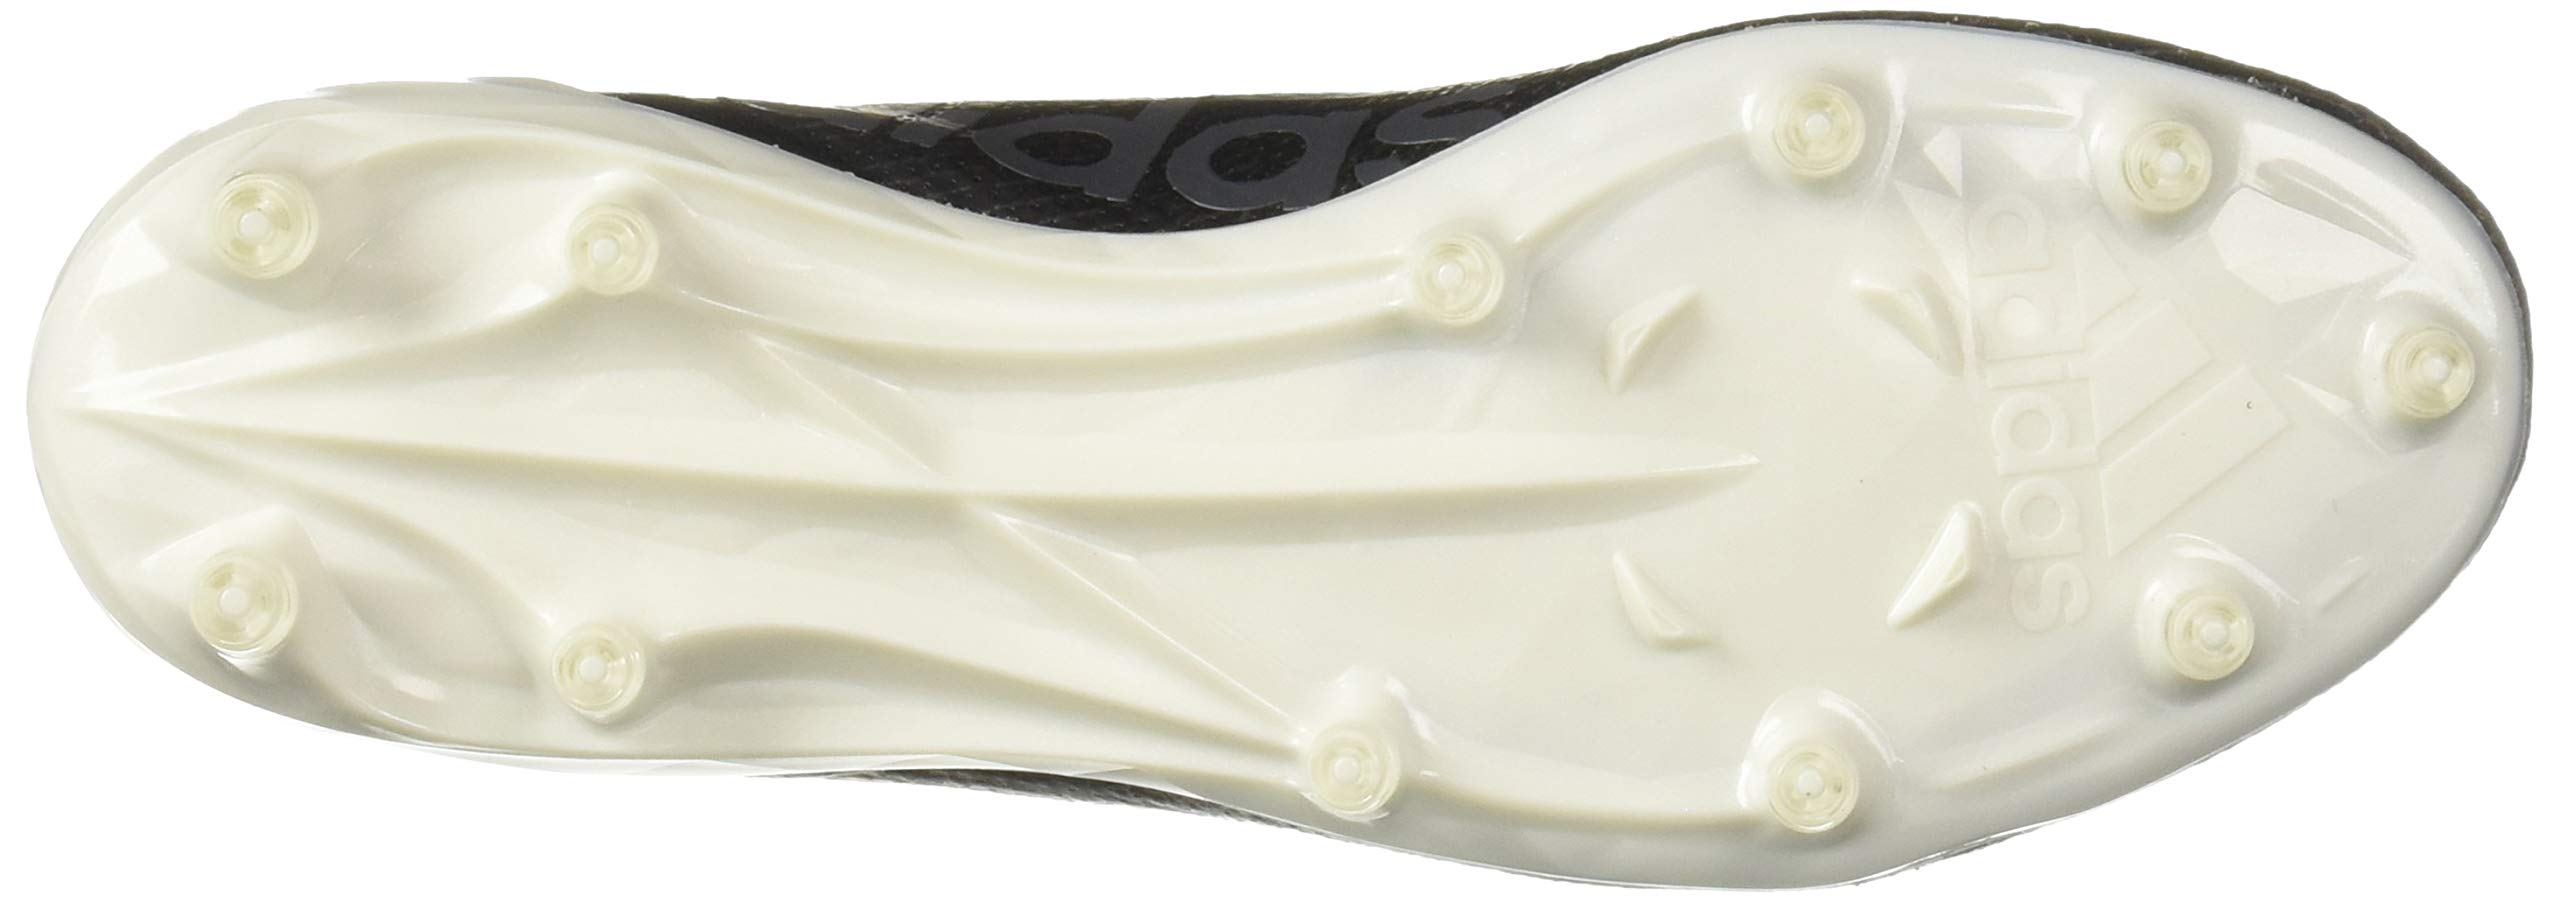 adidas Men's Adizero 8.0 Football Shoe Black/White/Grey 6.5 M US by adidas (Image #3)